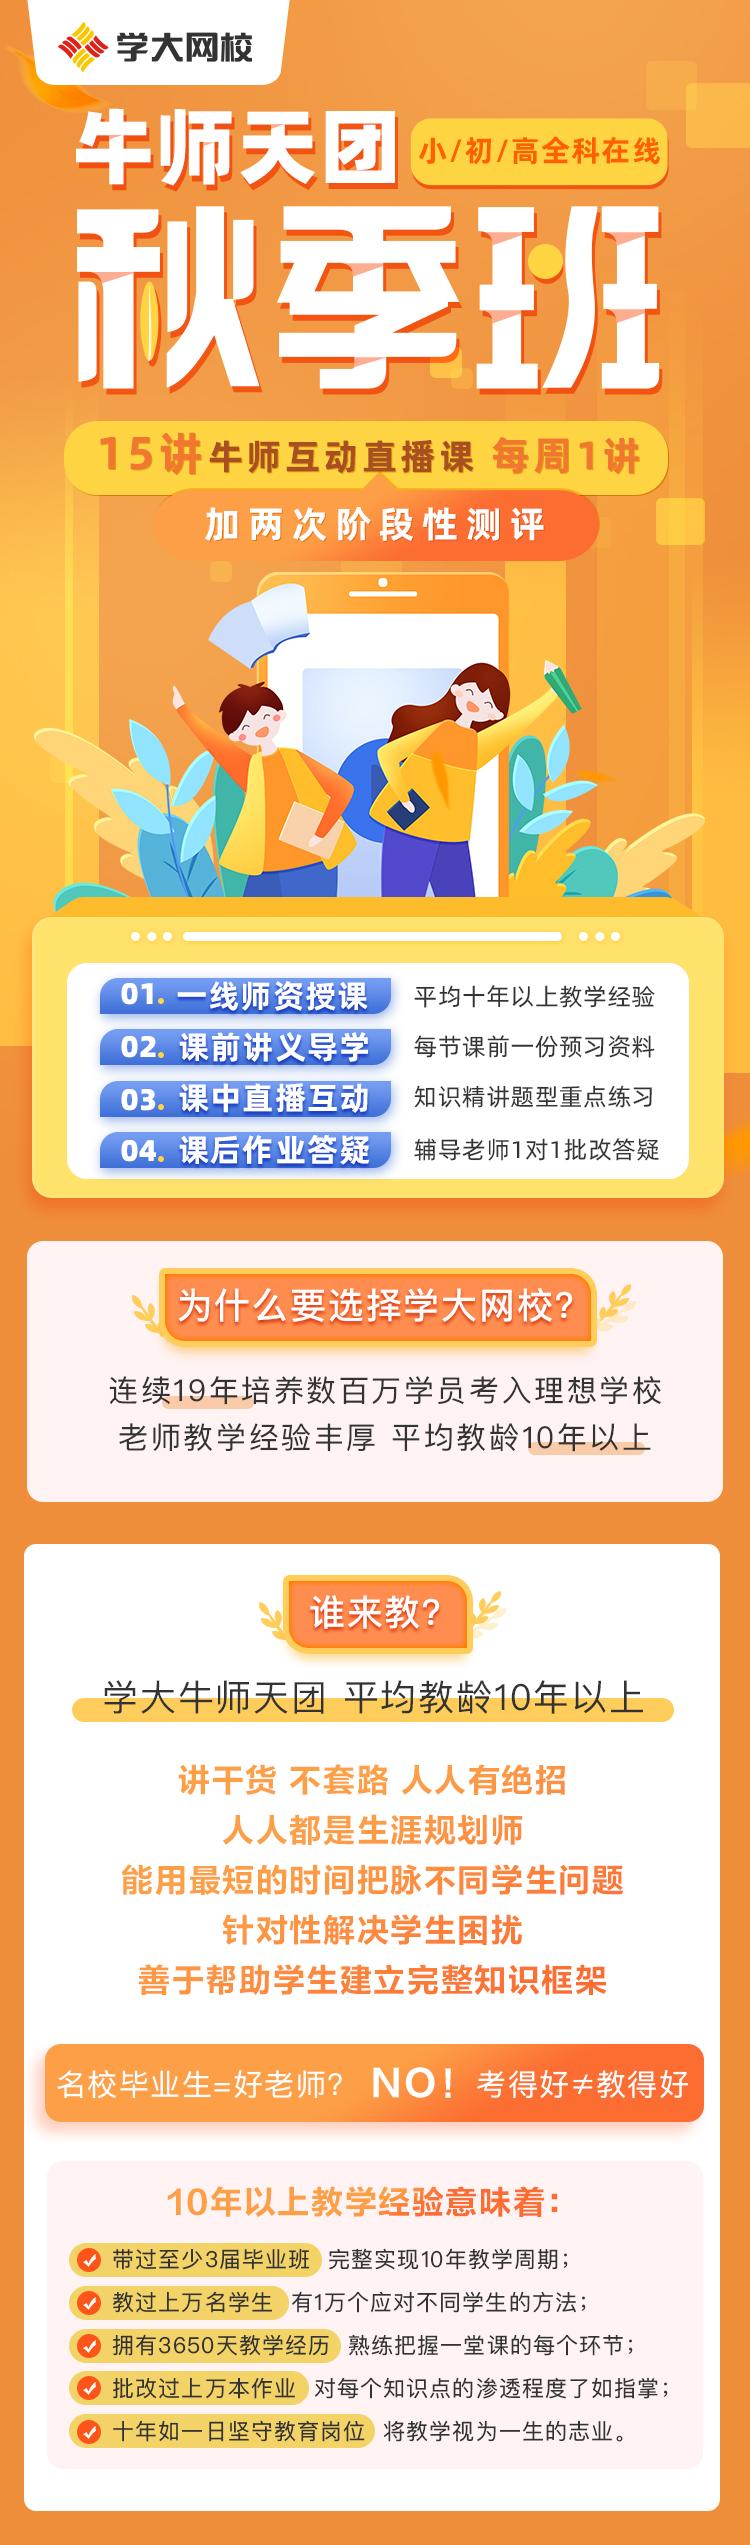 https://xdo-storage.oss-cn-beijing.aliyuncs.com/2020/08/07/RjTTY7NTEbFBXIQ3uqO0uINQj3d3V3UmIdwdWREa.jpeg